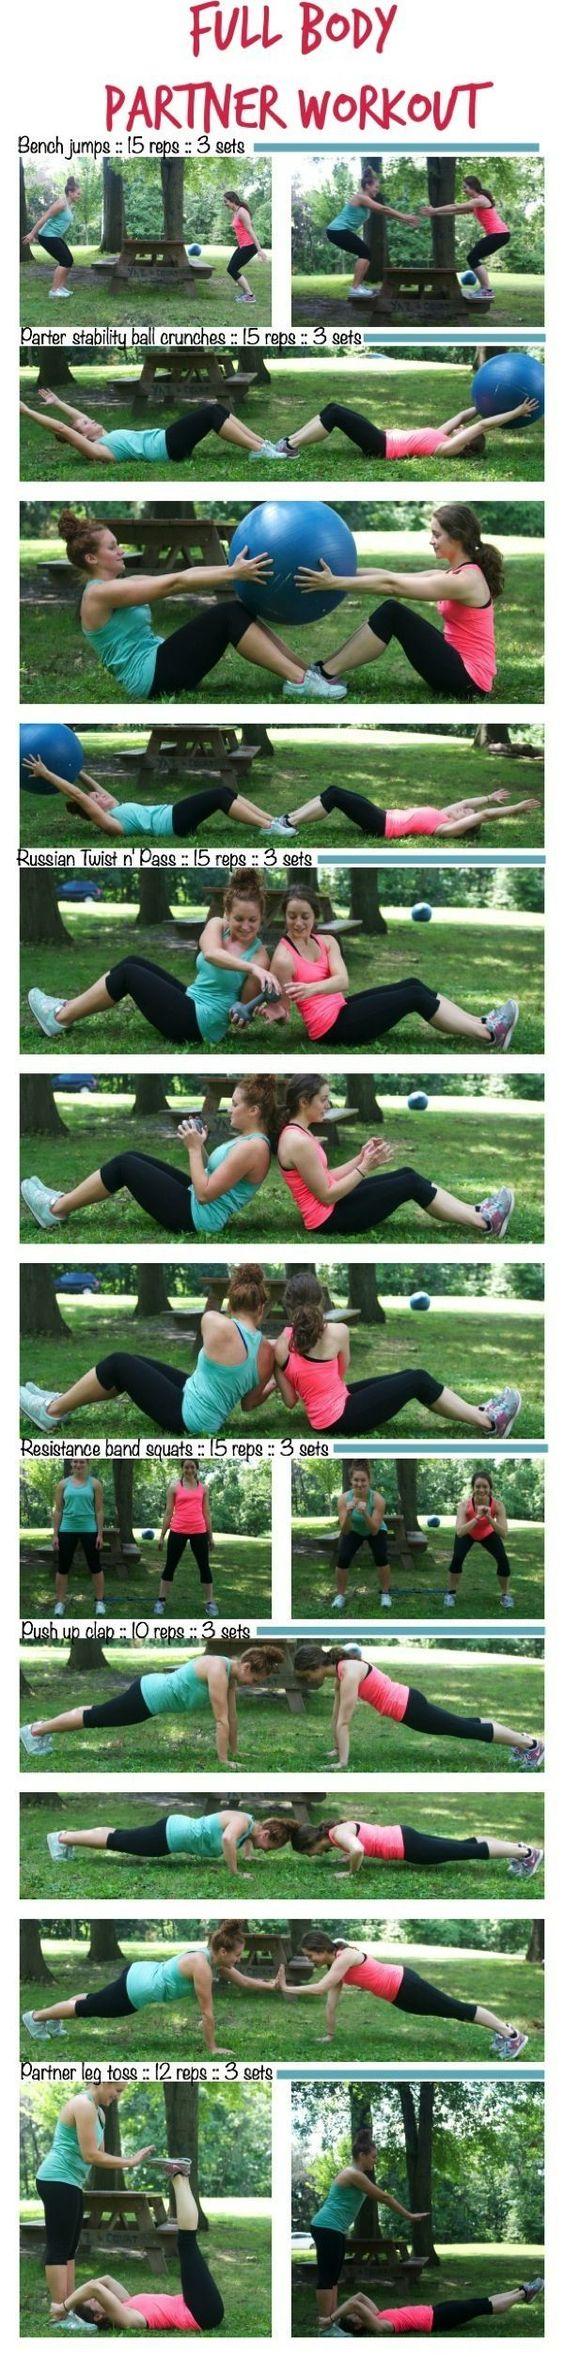 Full Body Partner Workout1.jpg http://thealmondeater.com/2014/09/full-body-partner-workout/ #Fitness #Nutrition Pin/Source -